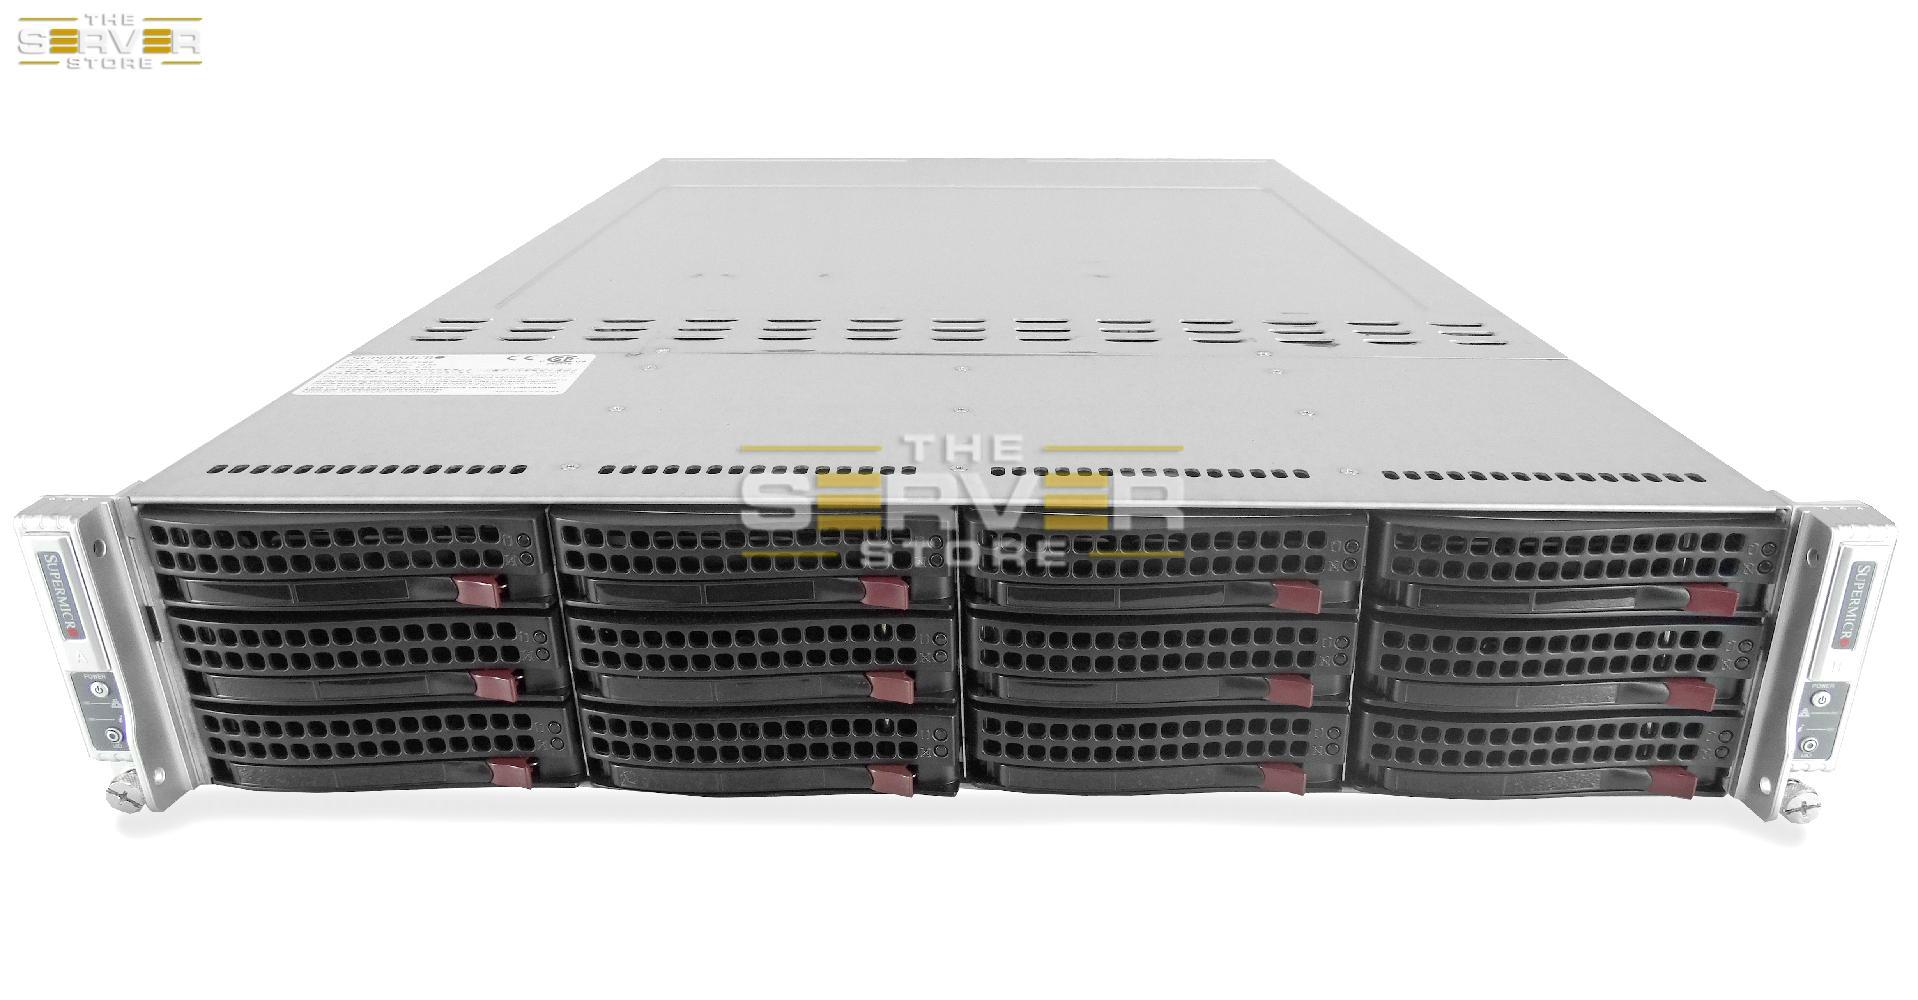 SuperMicro FatTwin 6027TR-DTRF 12x 2U LFF 2-Node Server